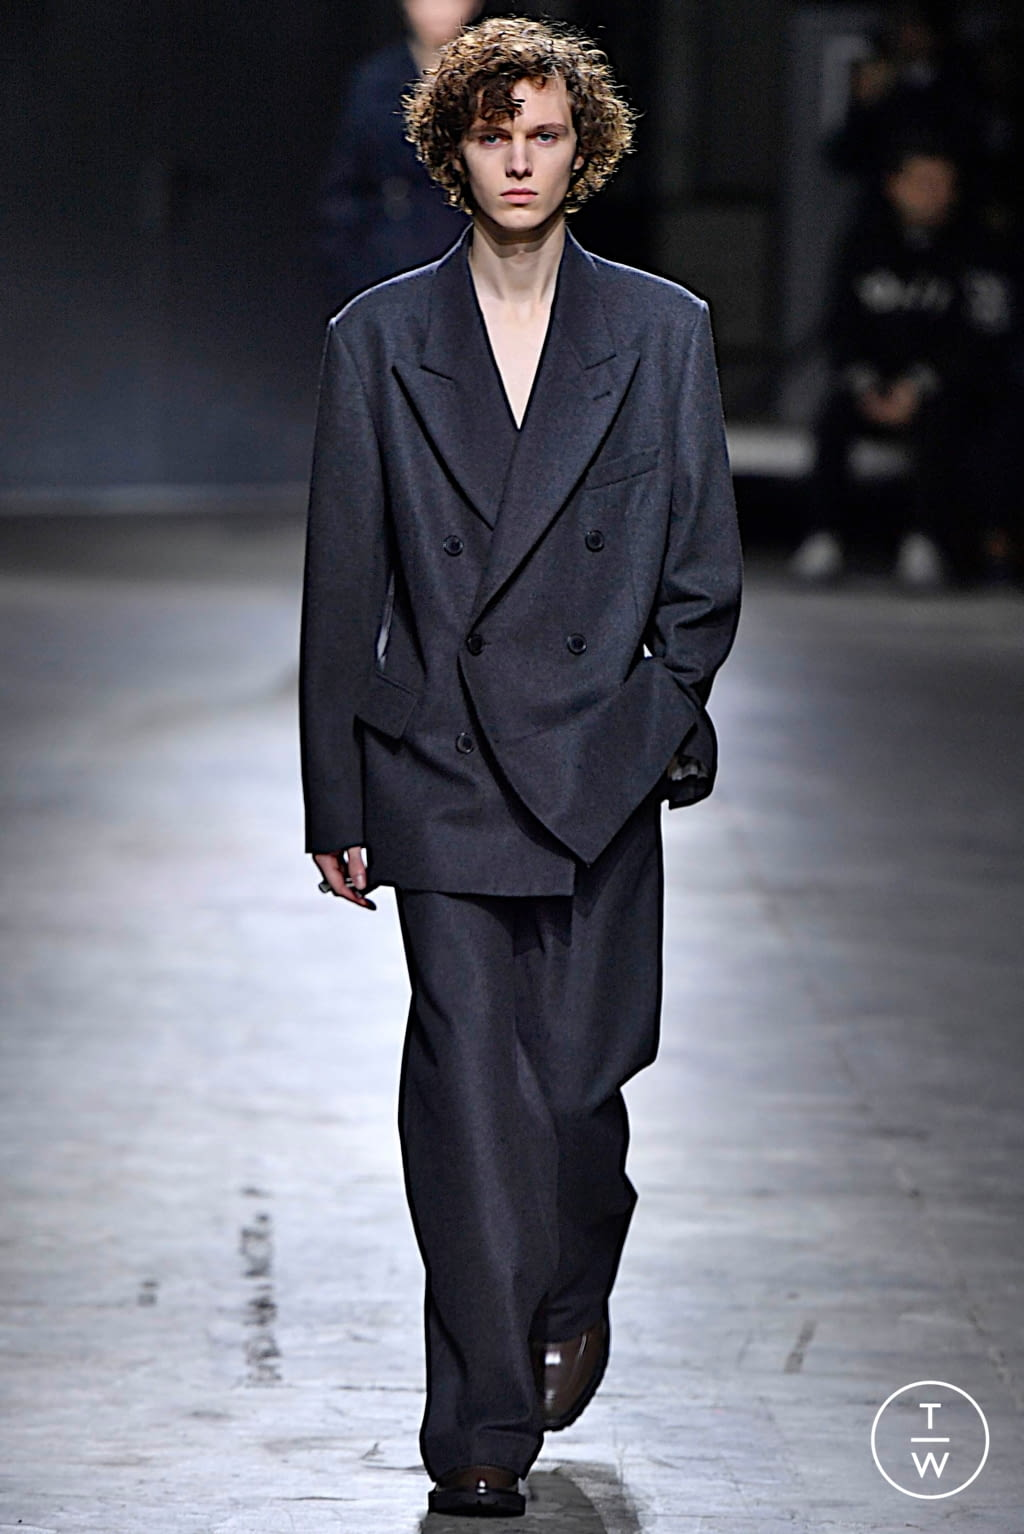 Fairy Baby Baby Boy Formale Abito a Maniche Corte Tuxedo Plaid Gentleman Suit